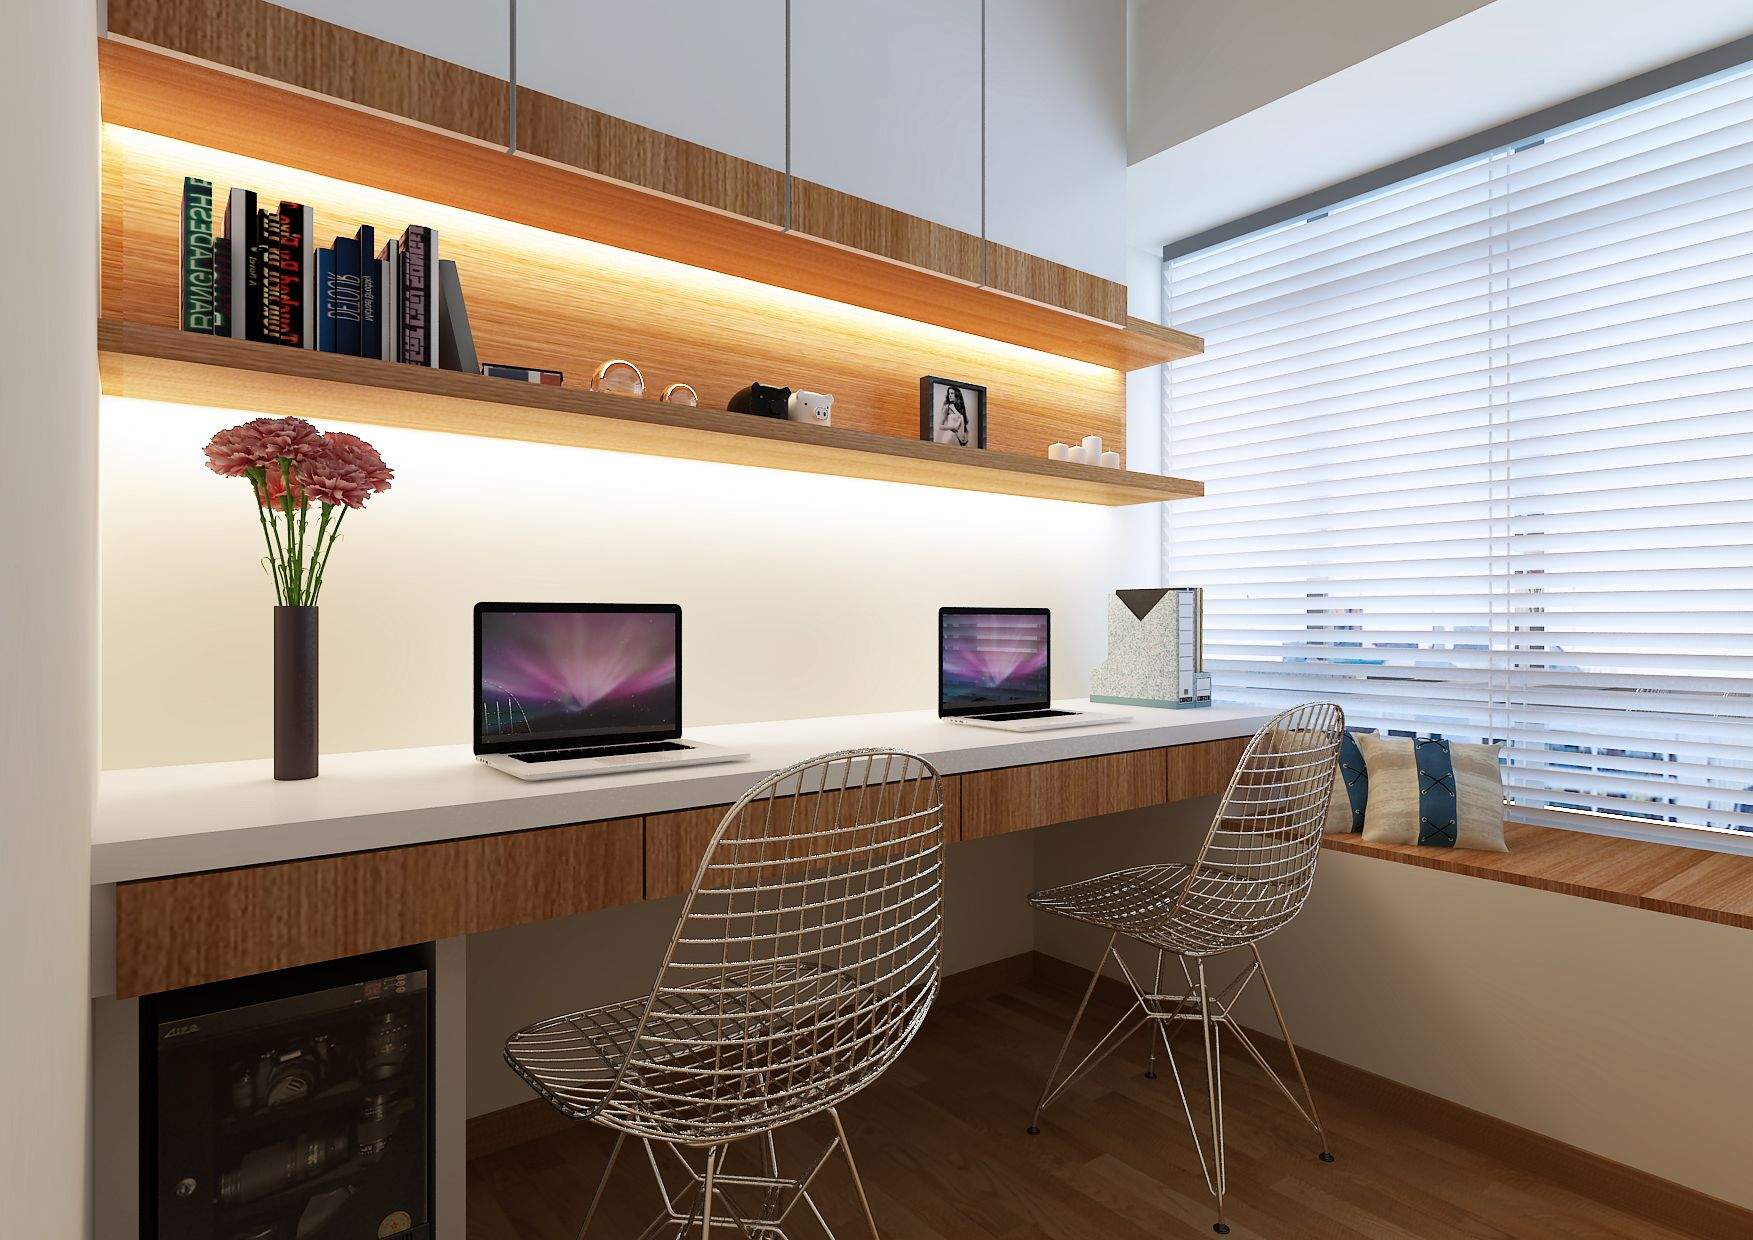 Study Room Design Modern Classic Home Art Decor 88859 Study Room Small Small Room Design Study Room Design